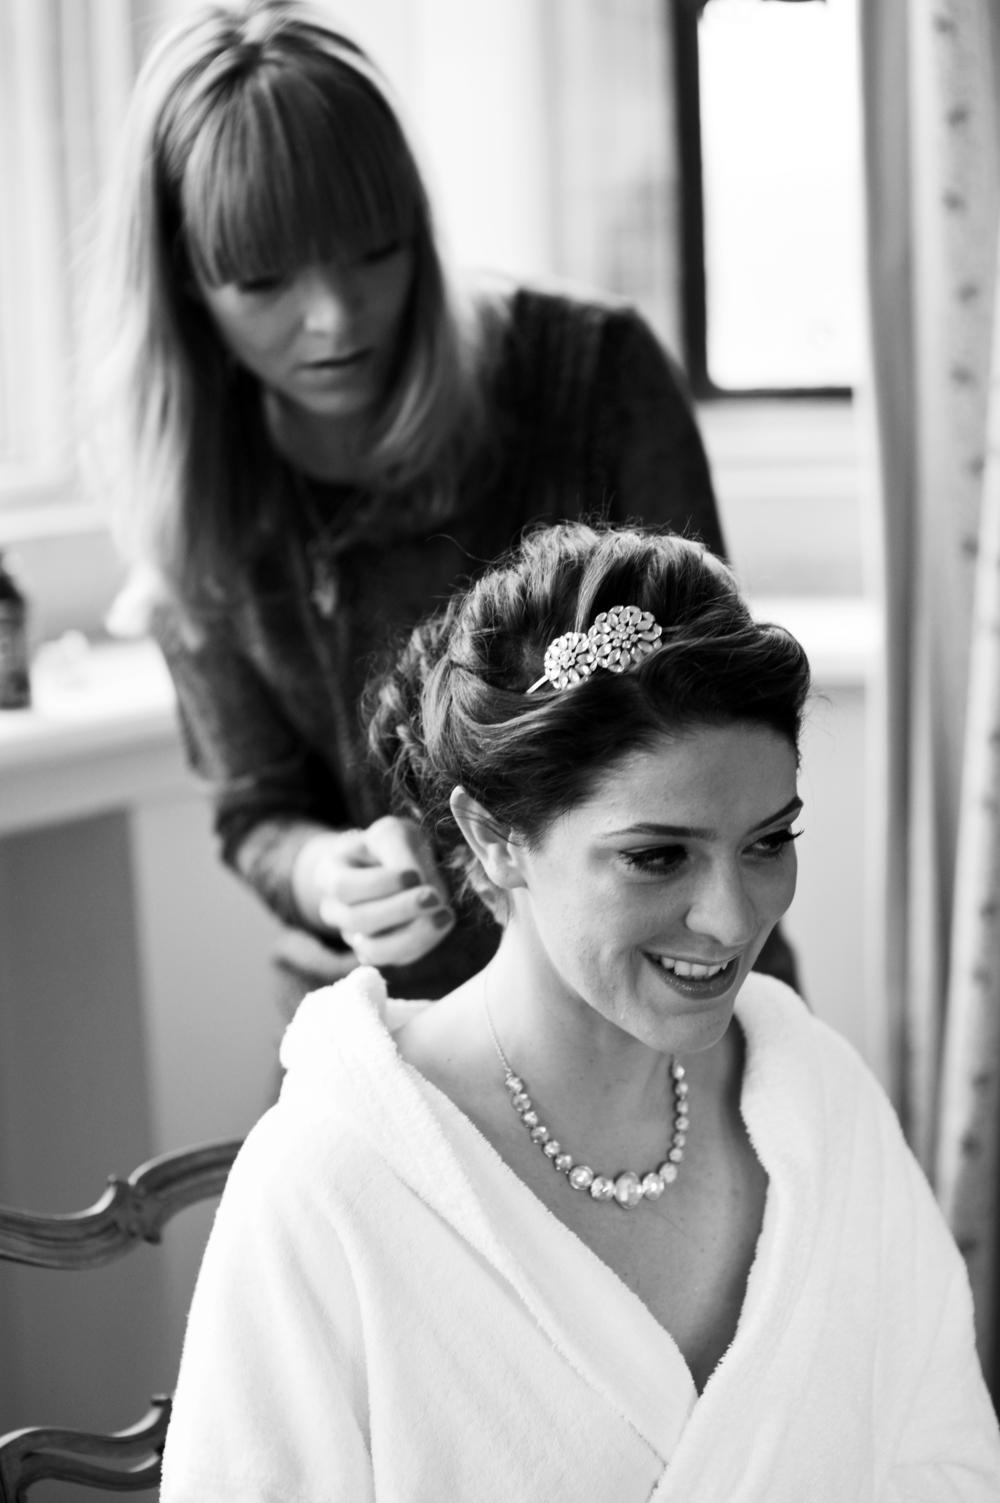 Jo Styling Bridesmaid's Hair